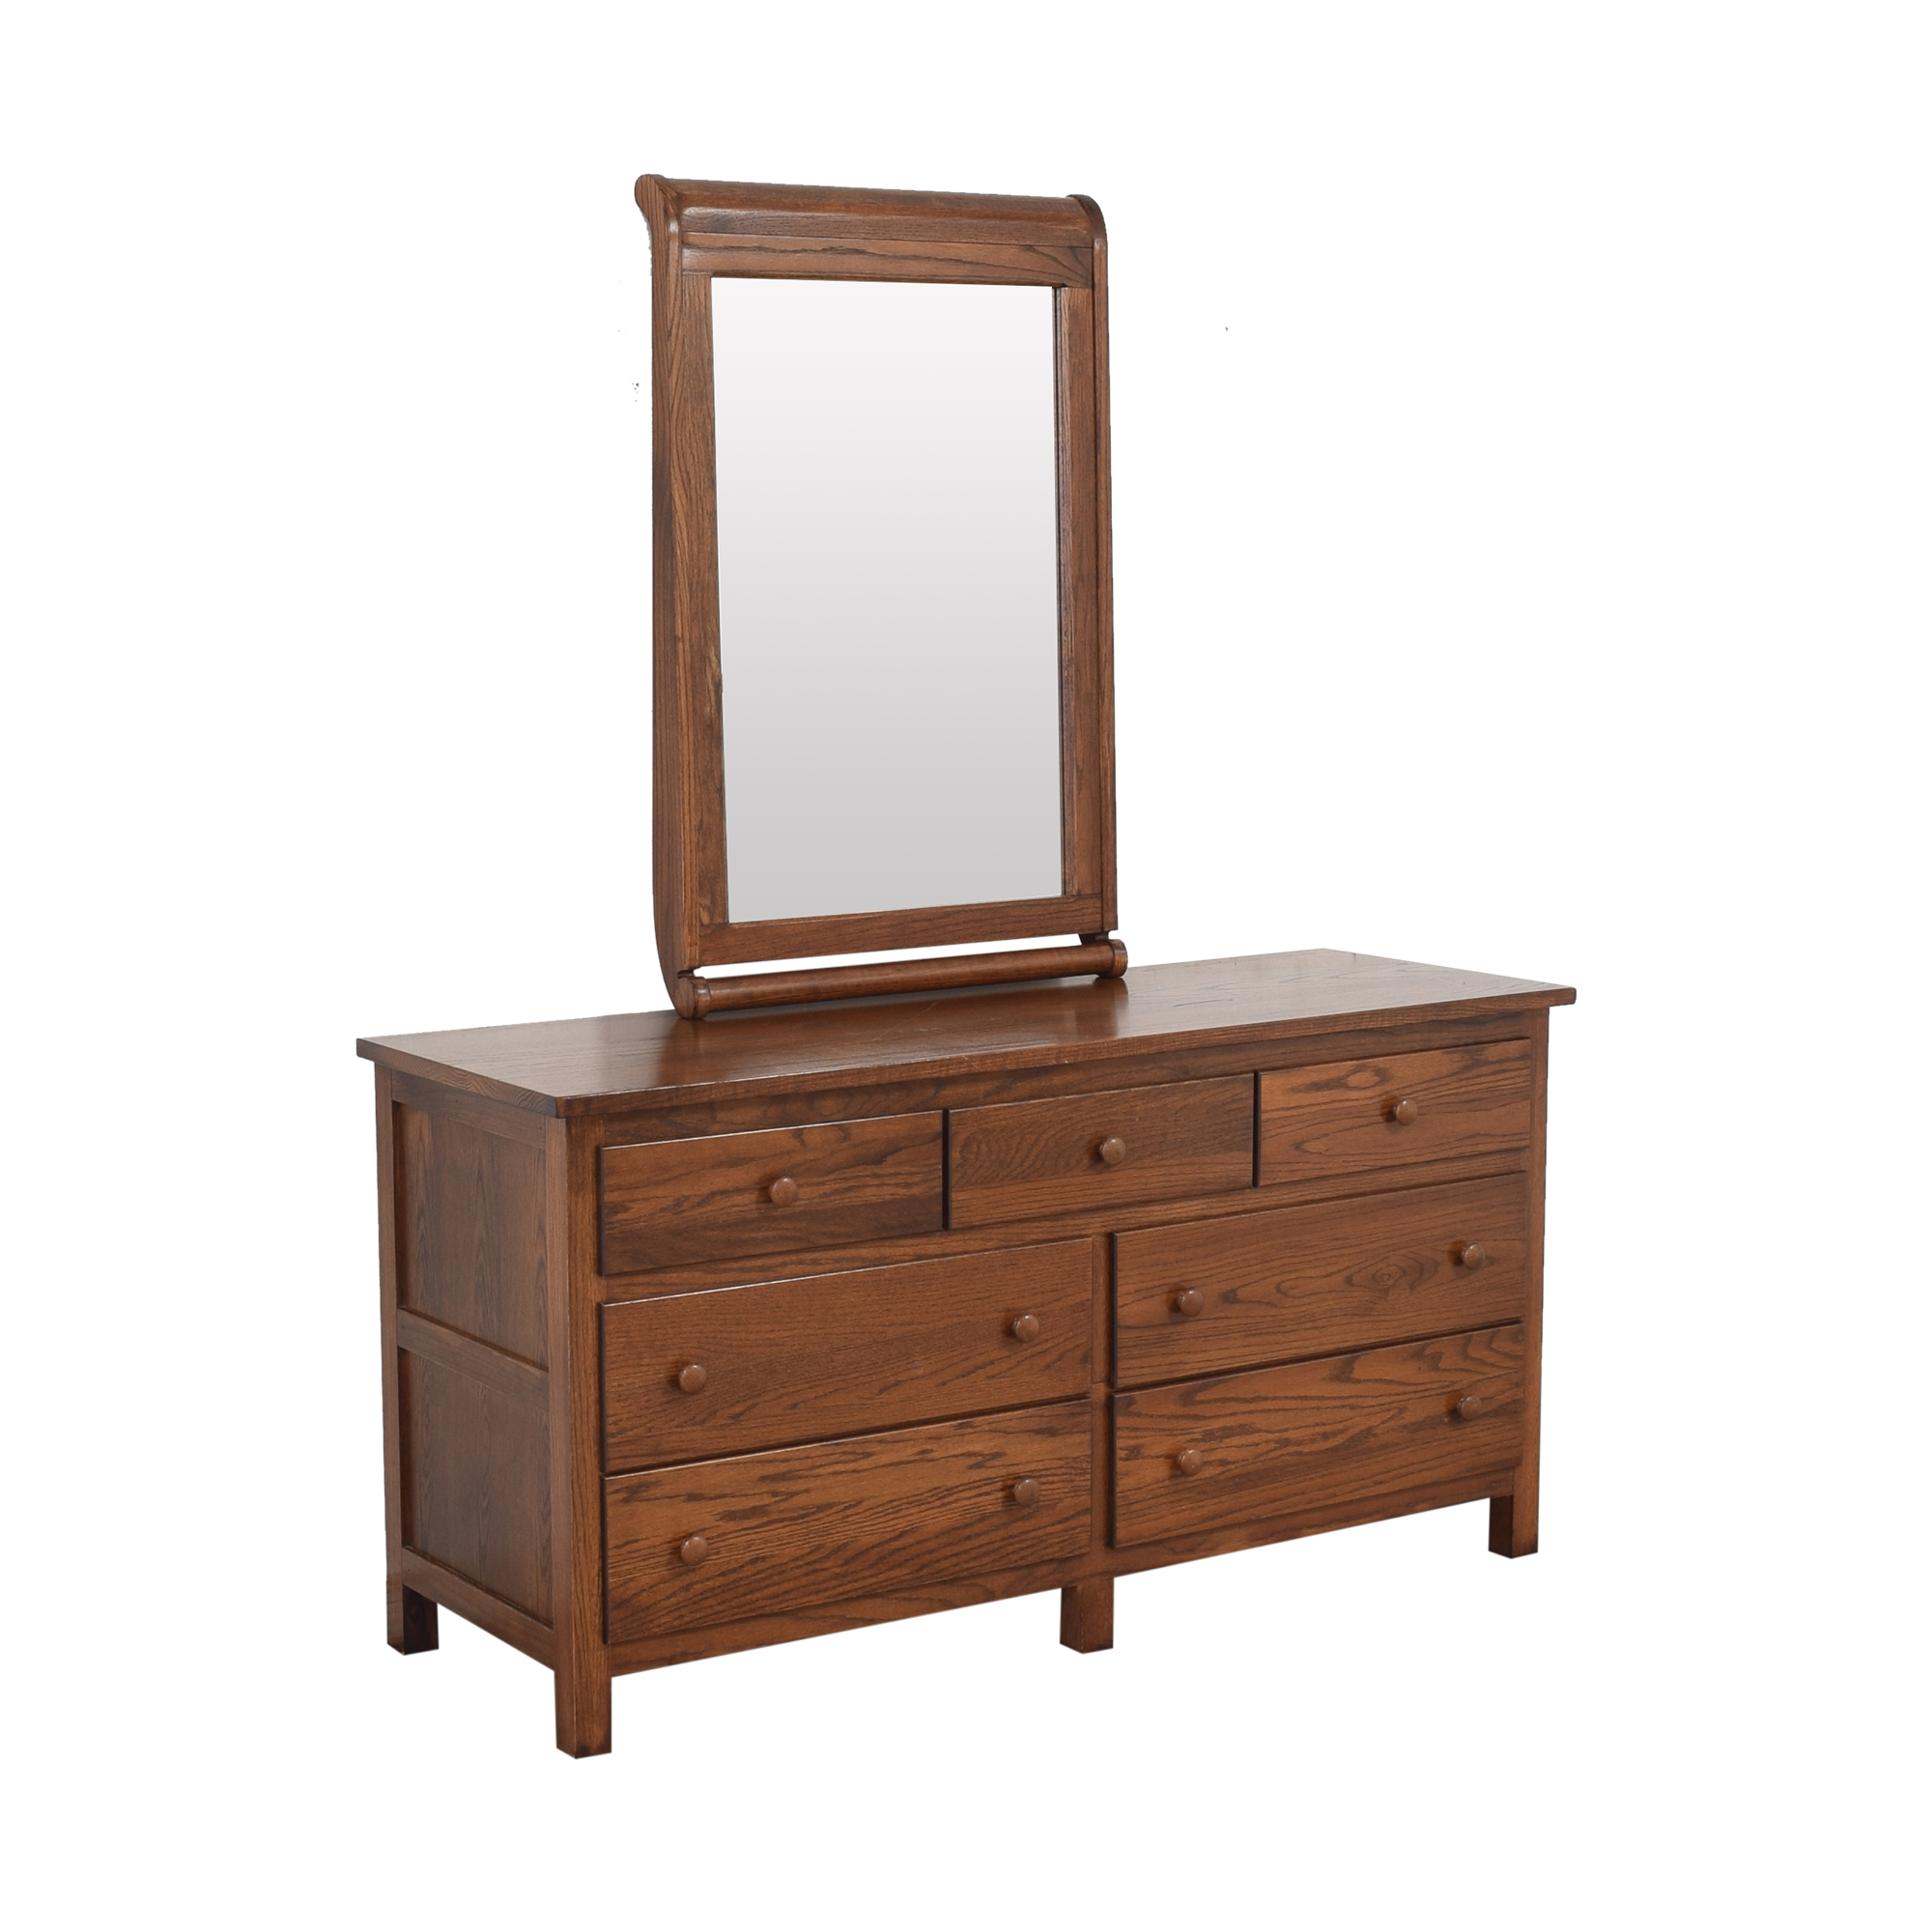 shop Baby's Dream Dresser with Mirror Baby's Dream Dressers